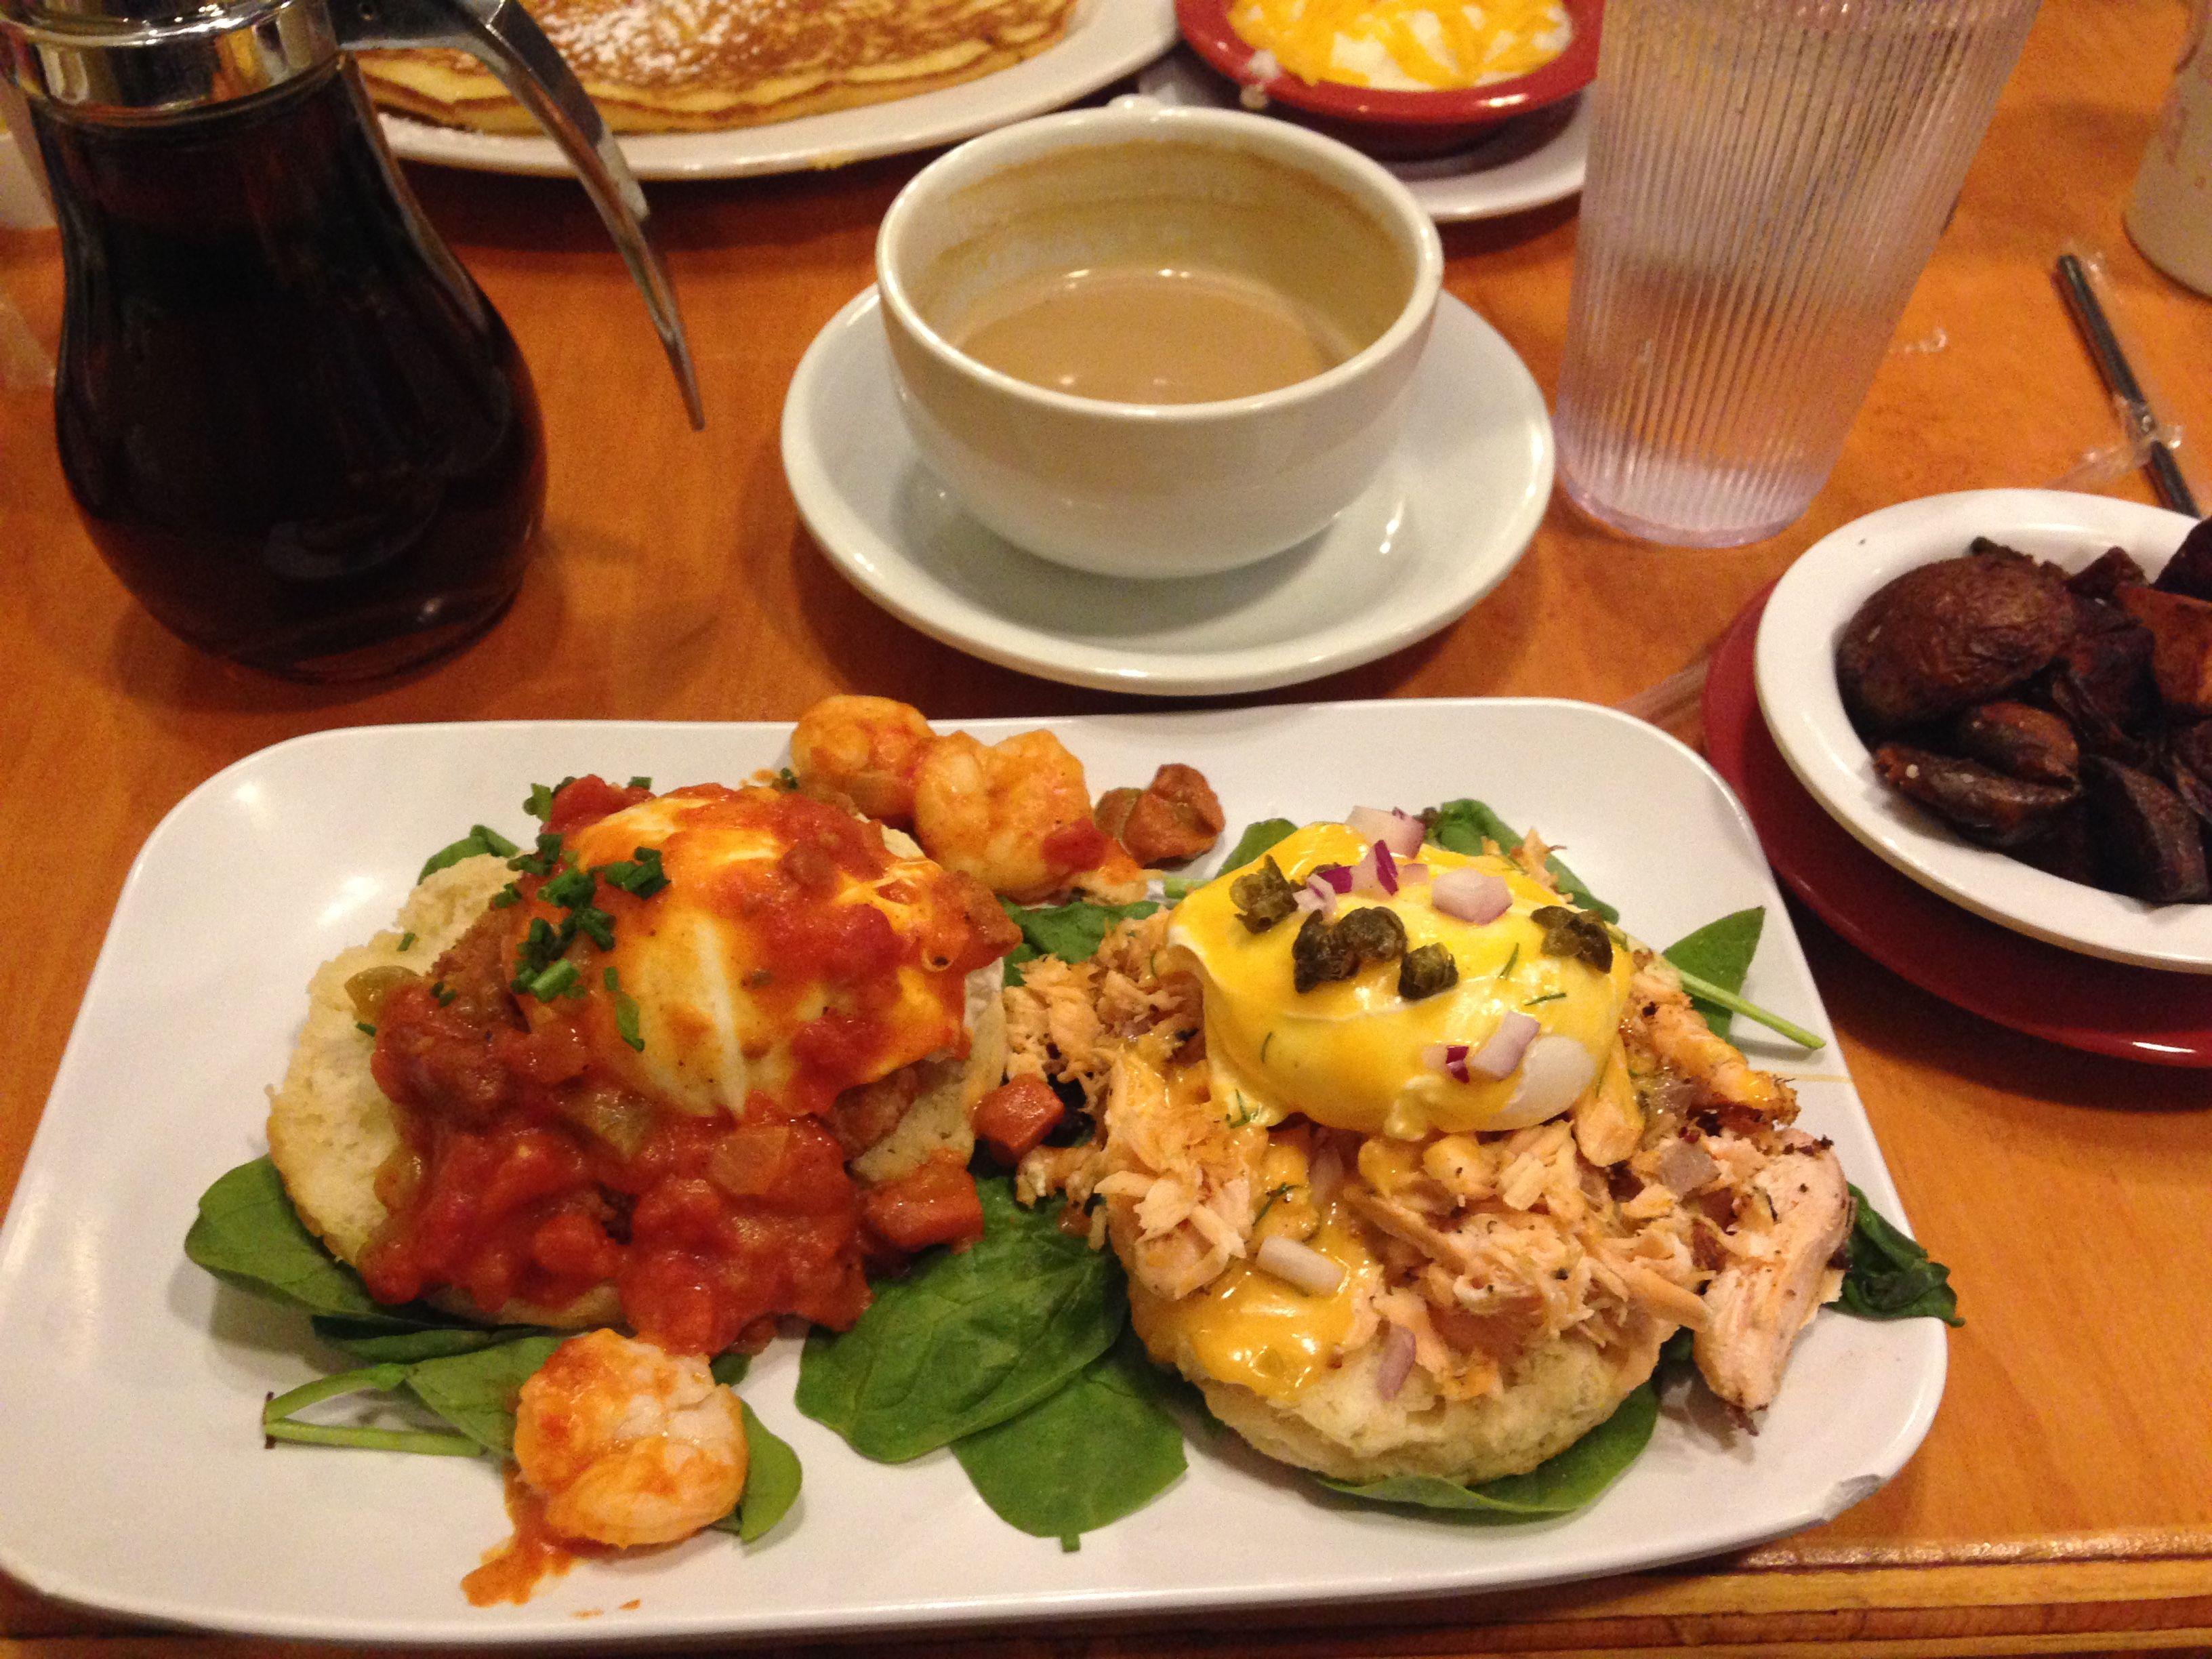 Photo of Benedict duo: Shrimp boogaloo (Gulf shrimp sautéed with pork tasso, served over…